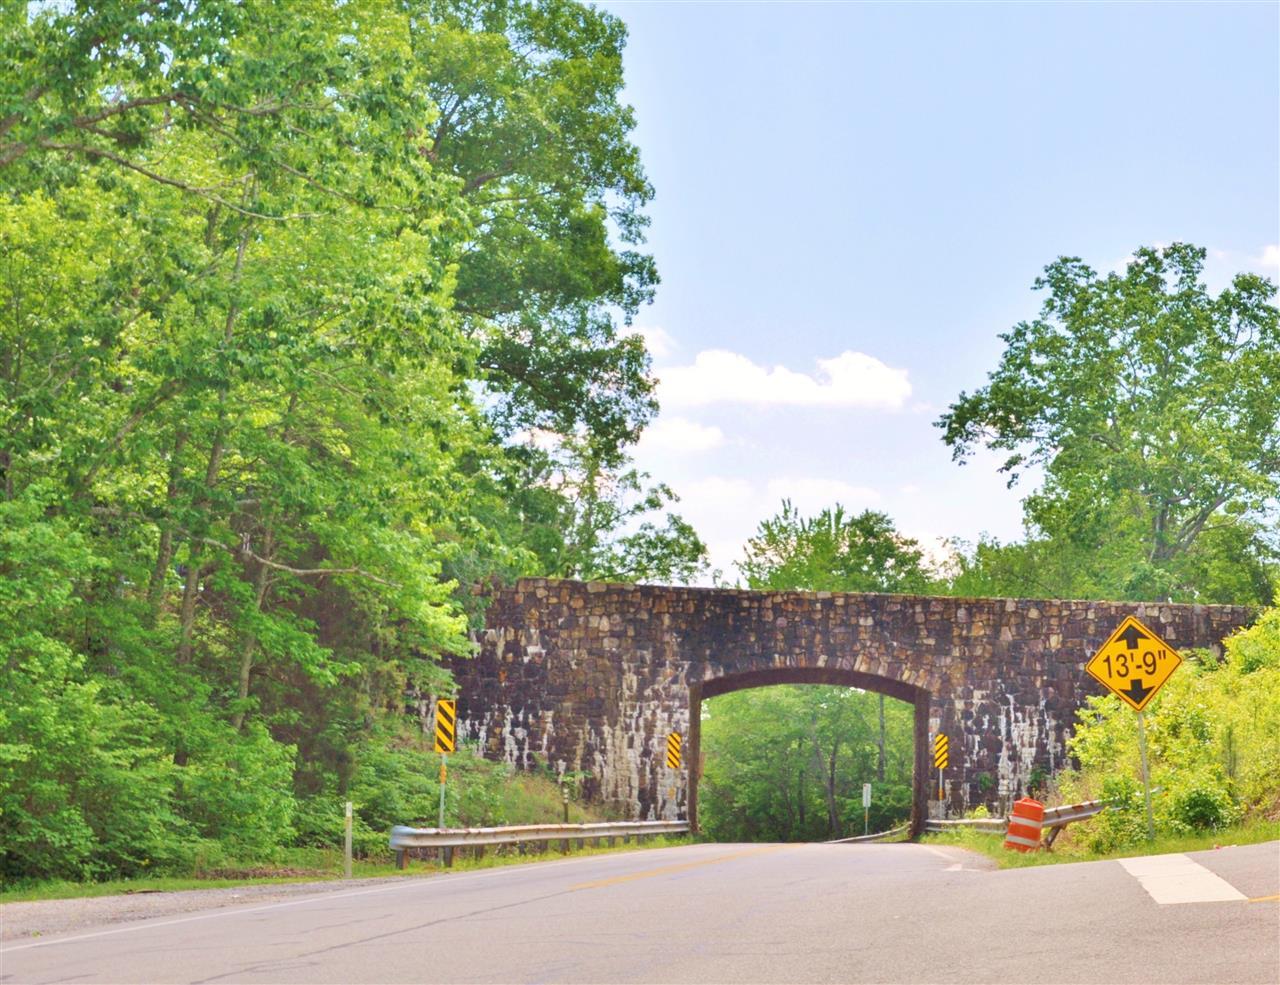 FDR Bridge in Pine Mountain, GA